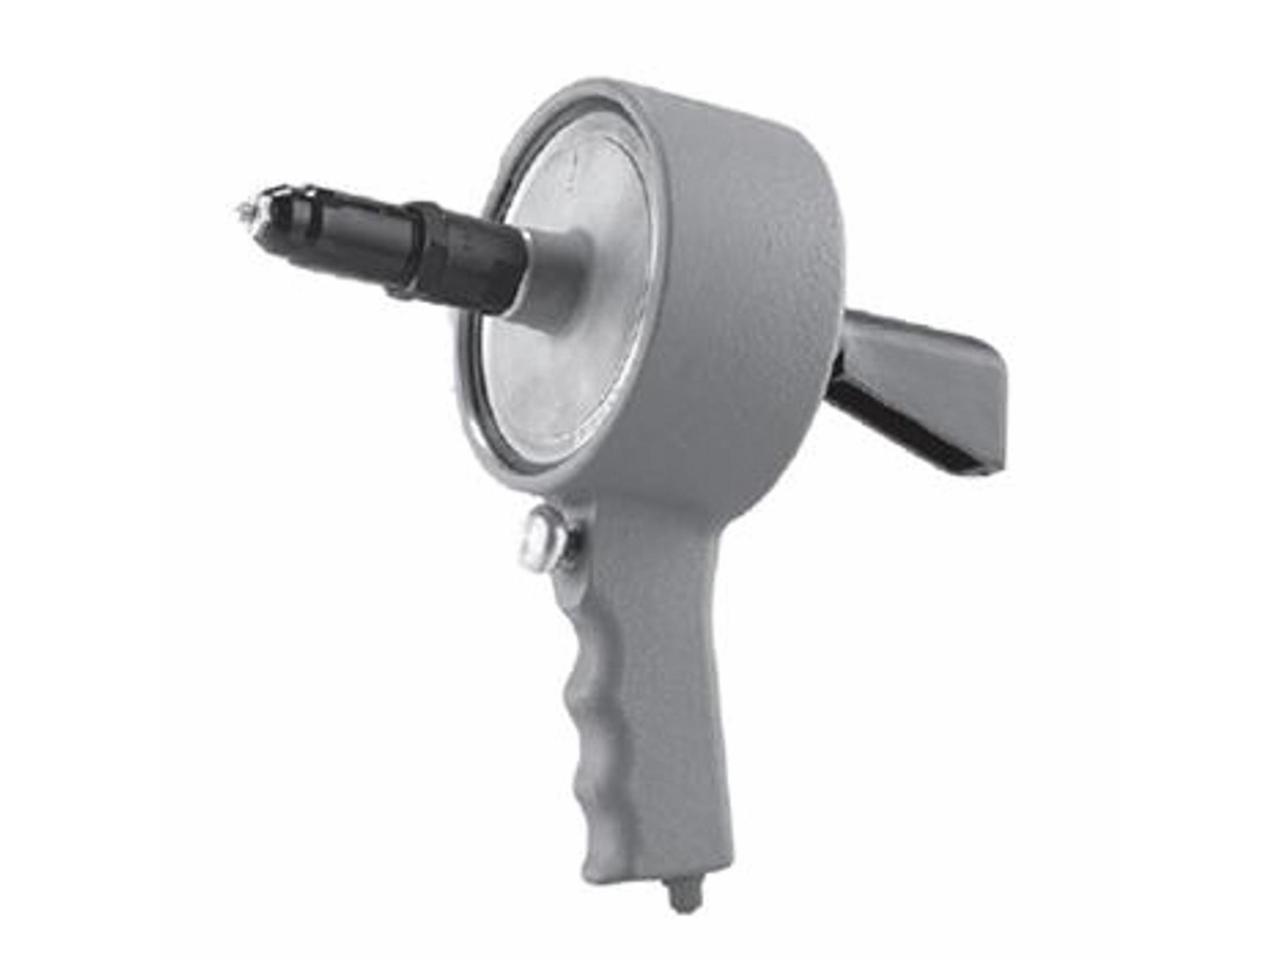 1457637 1 PK Gesipa Power Tool Powerbird Pro Gold 4400 18.5V Cordless Riveting Tool